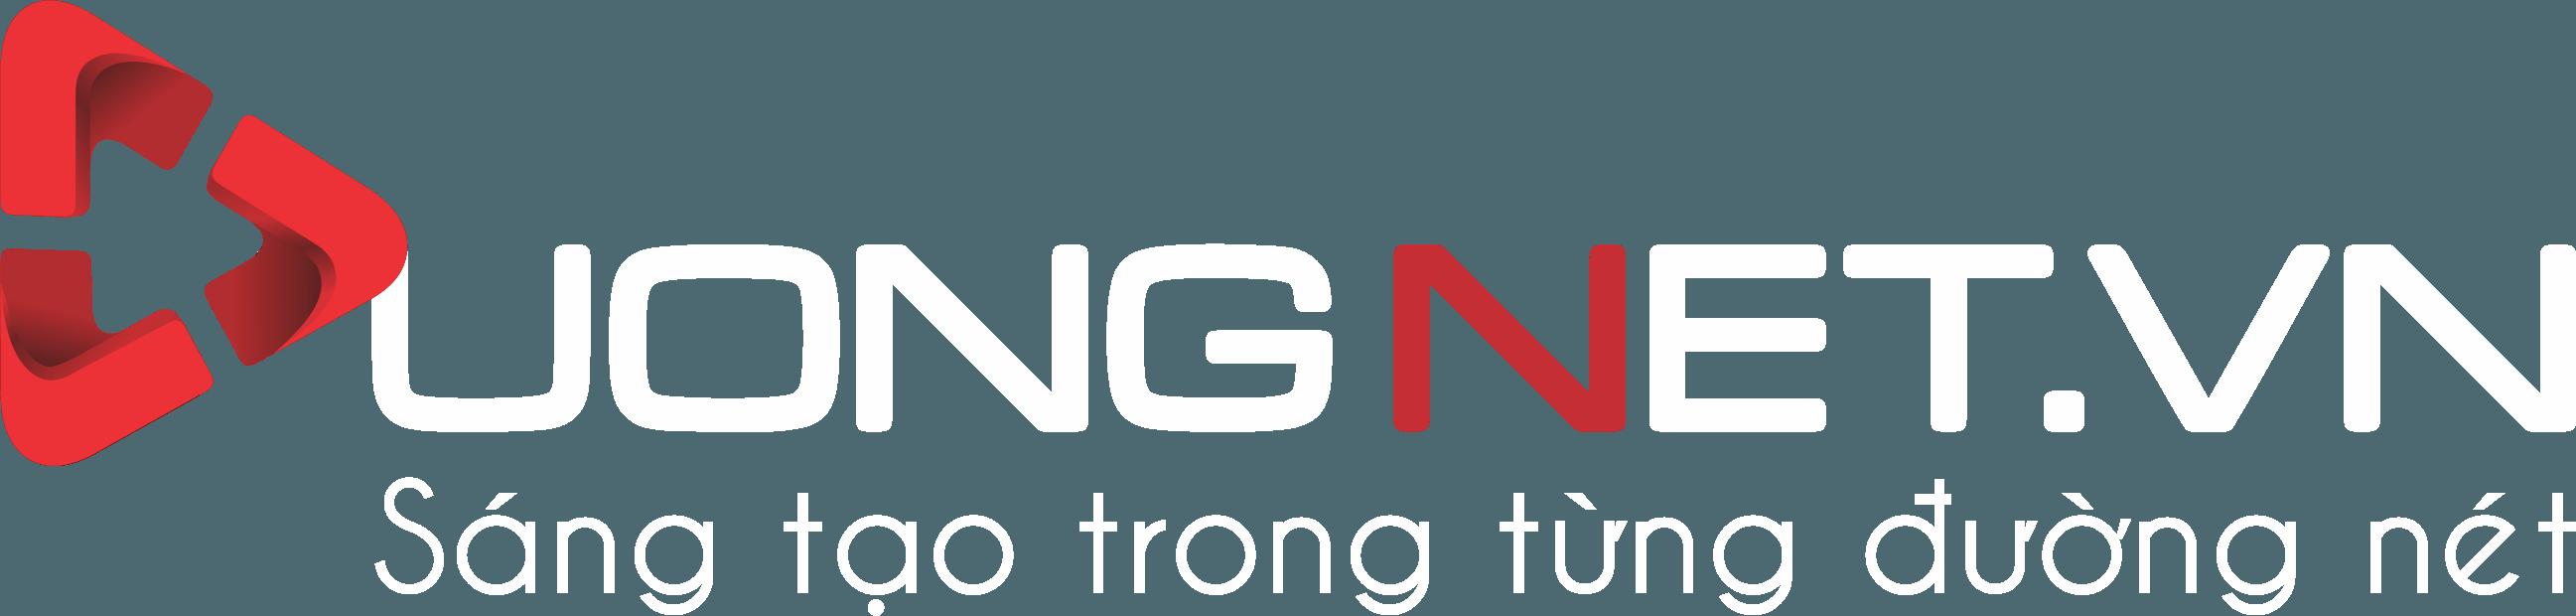 logo Đường Nét Footer